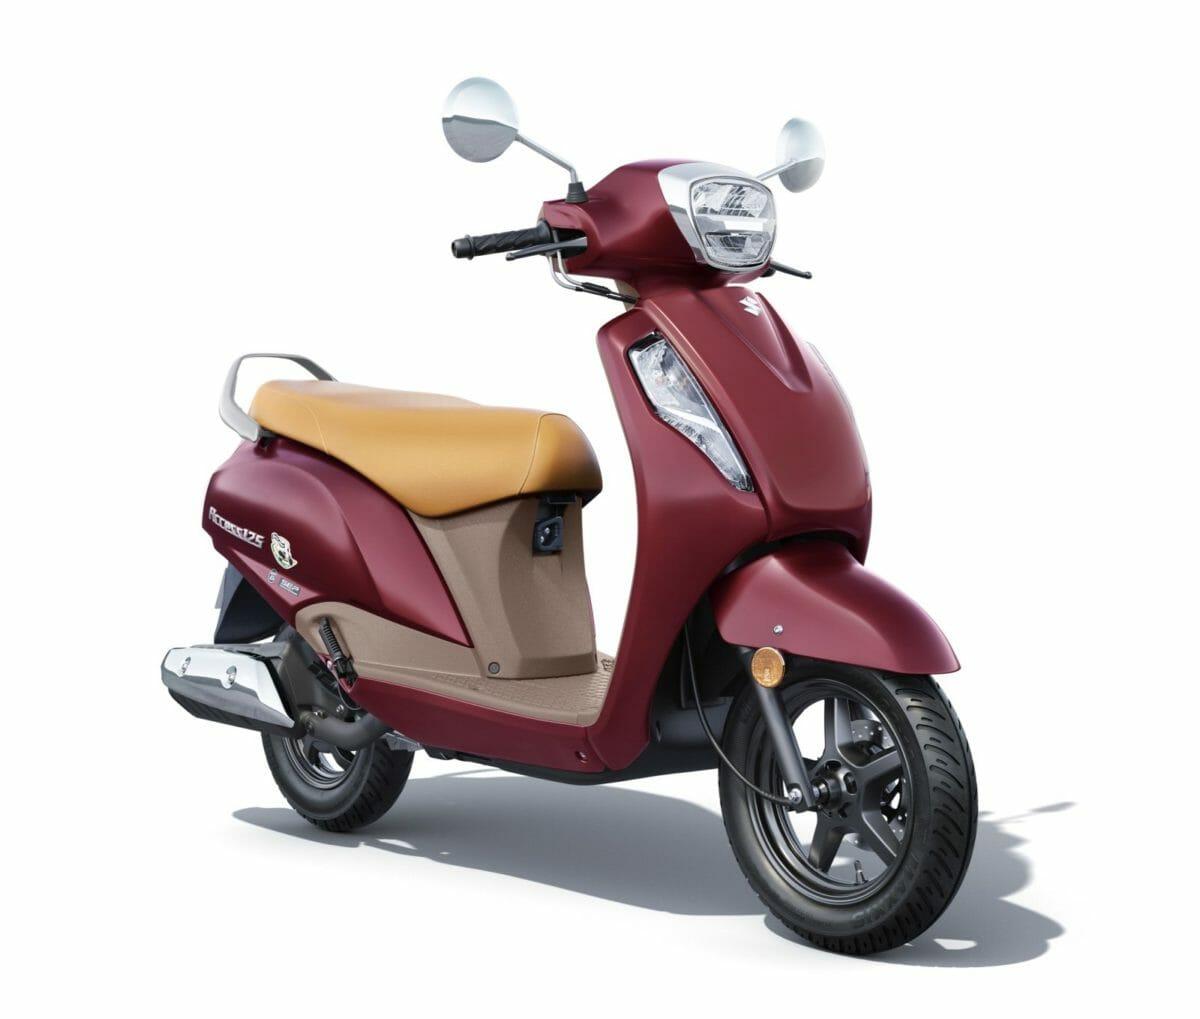 All New Suzuki Access 125 BS6